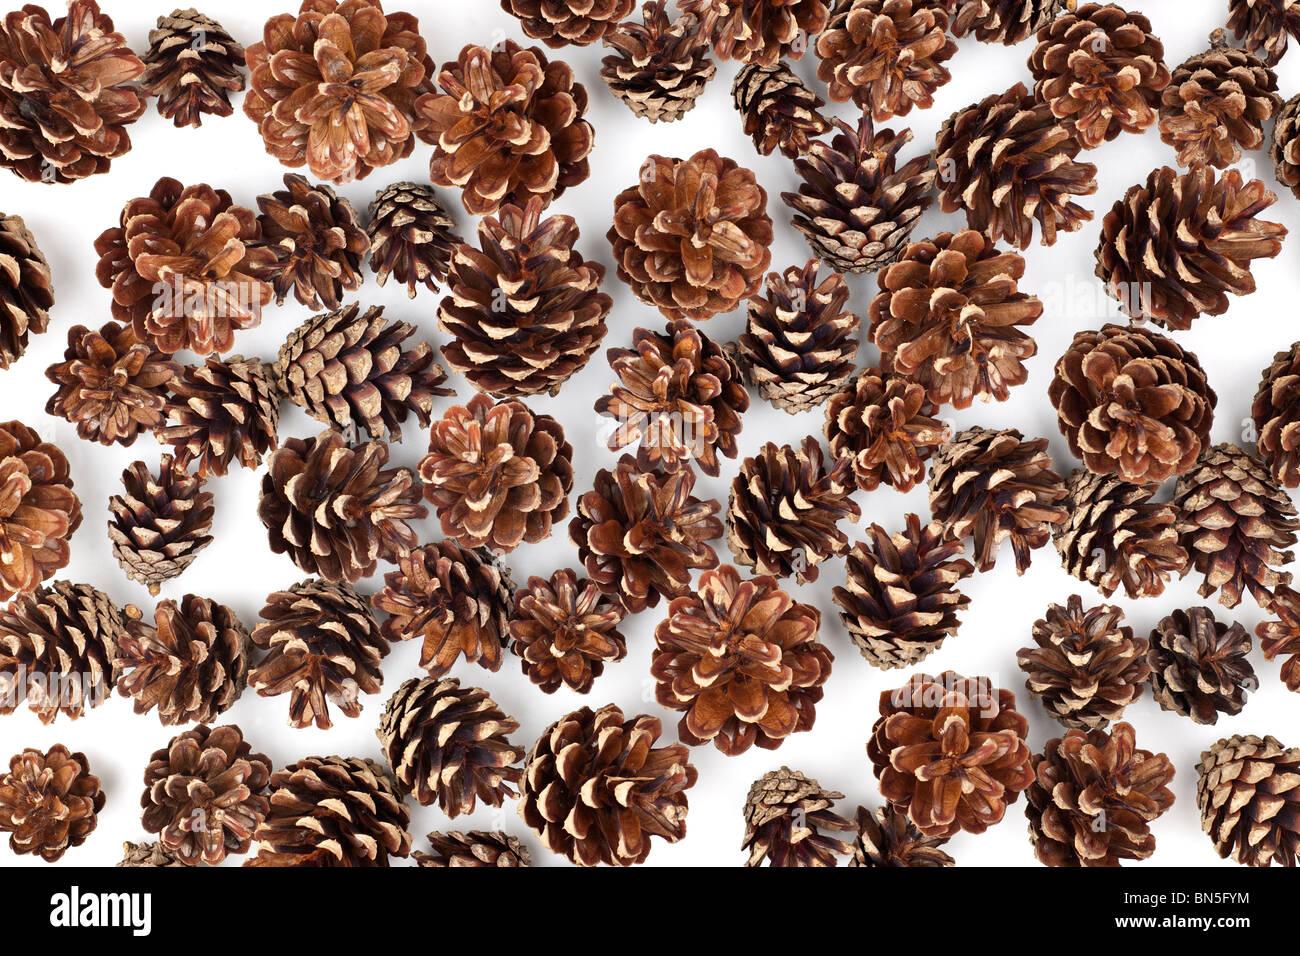 pile of pine cones - Stock Image